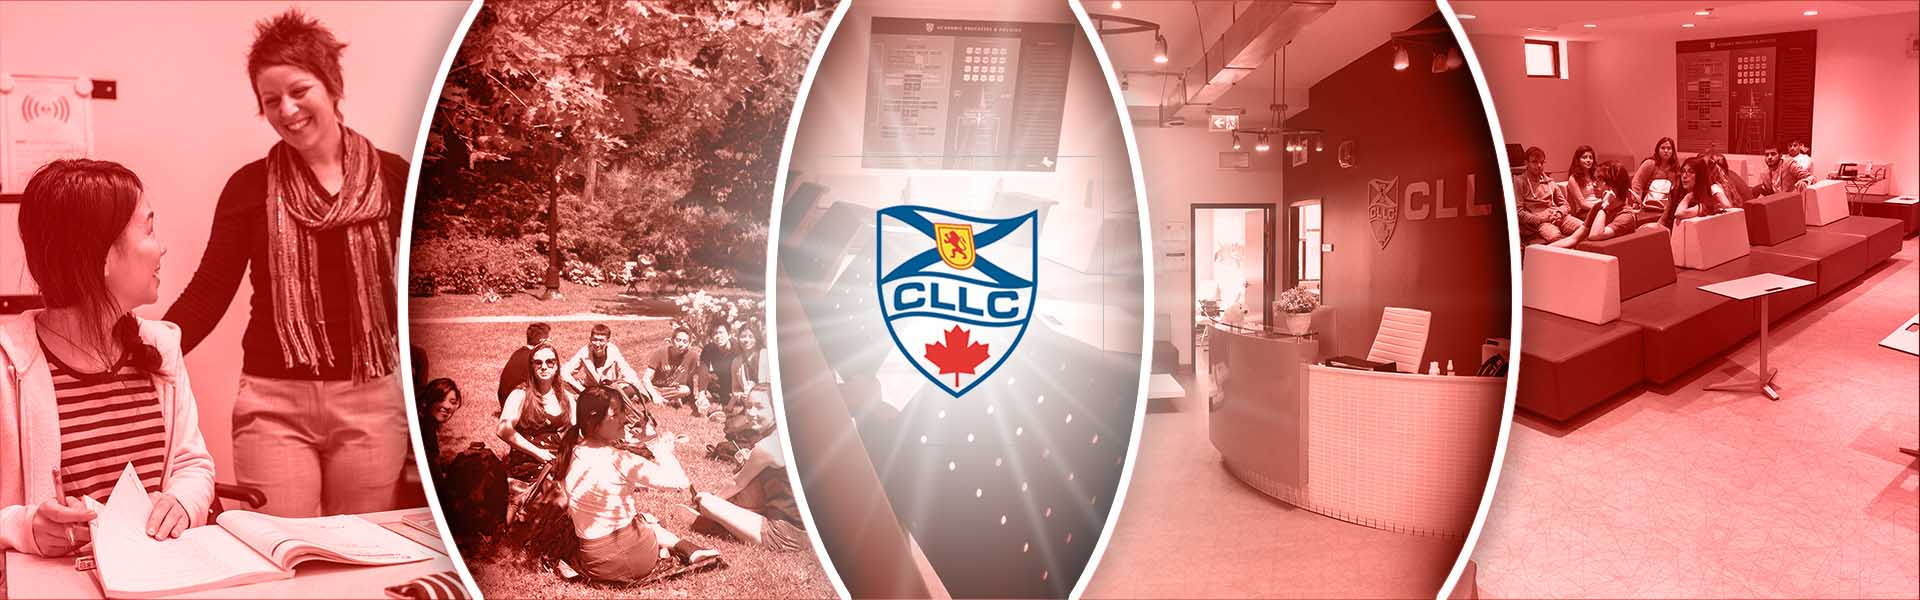 CLLC Toronto Dil Okulu